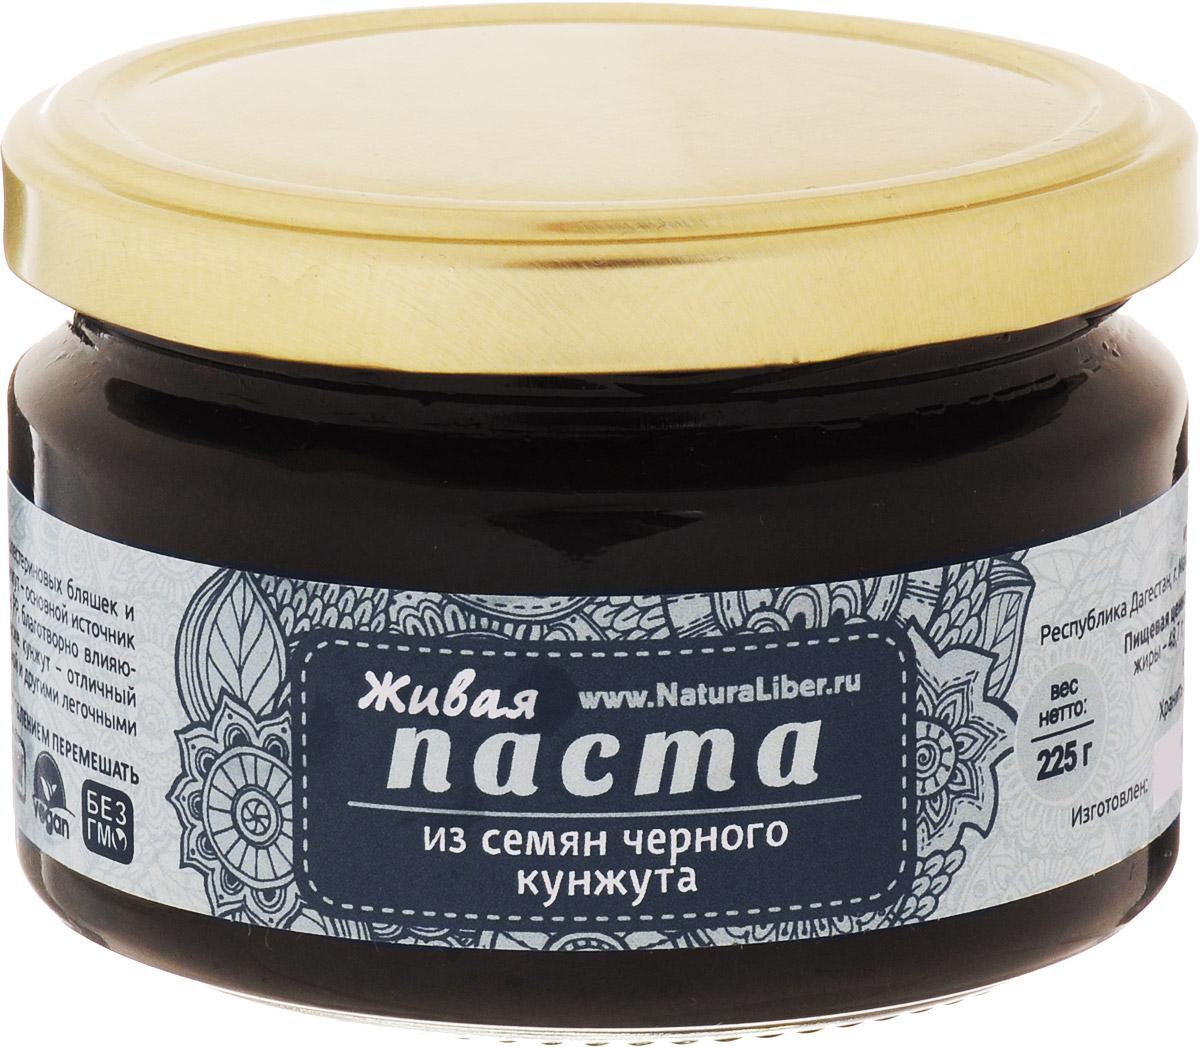 NaturaLiber паста из семян черного кунжута, 225 г